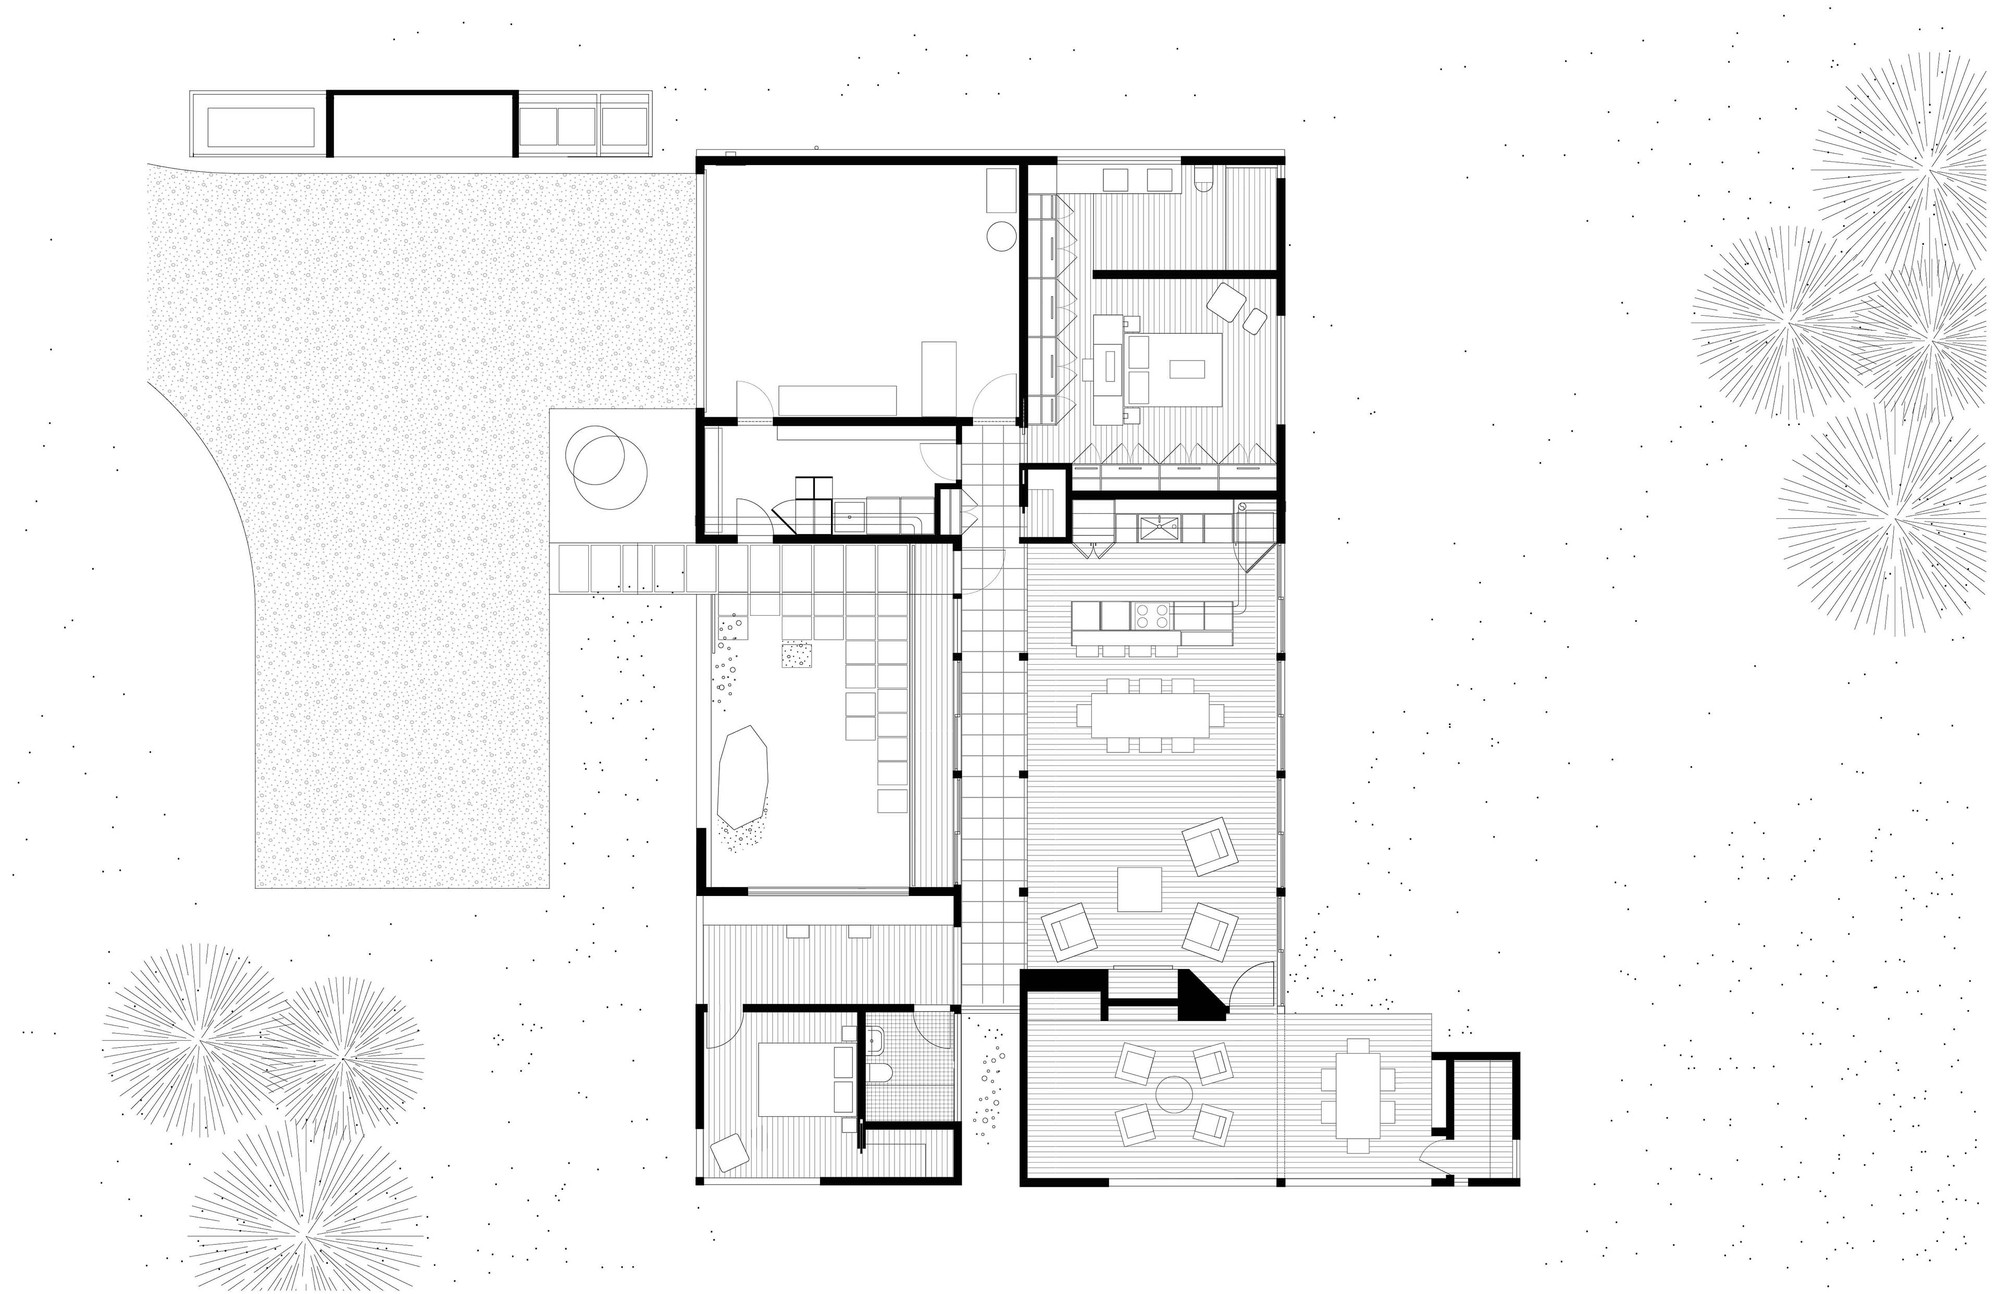 Image Result For Bedroom House Plans